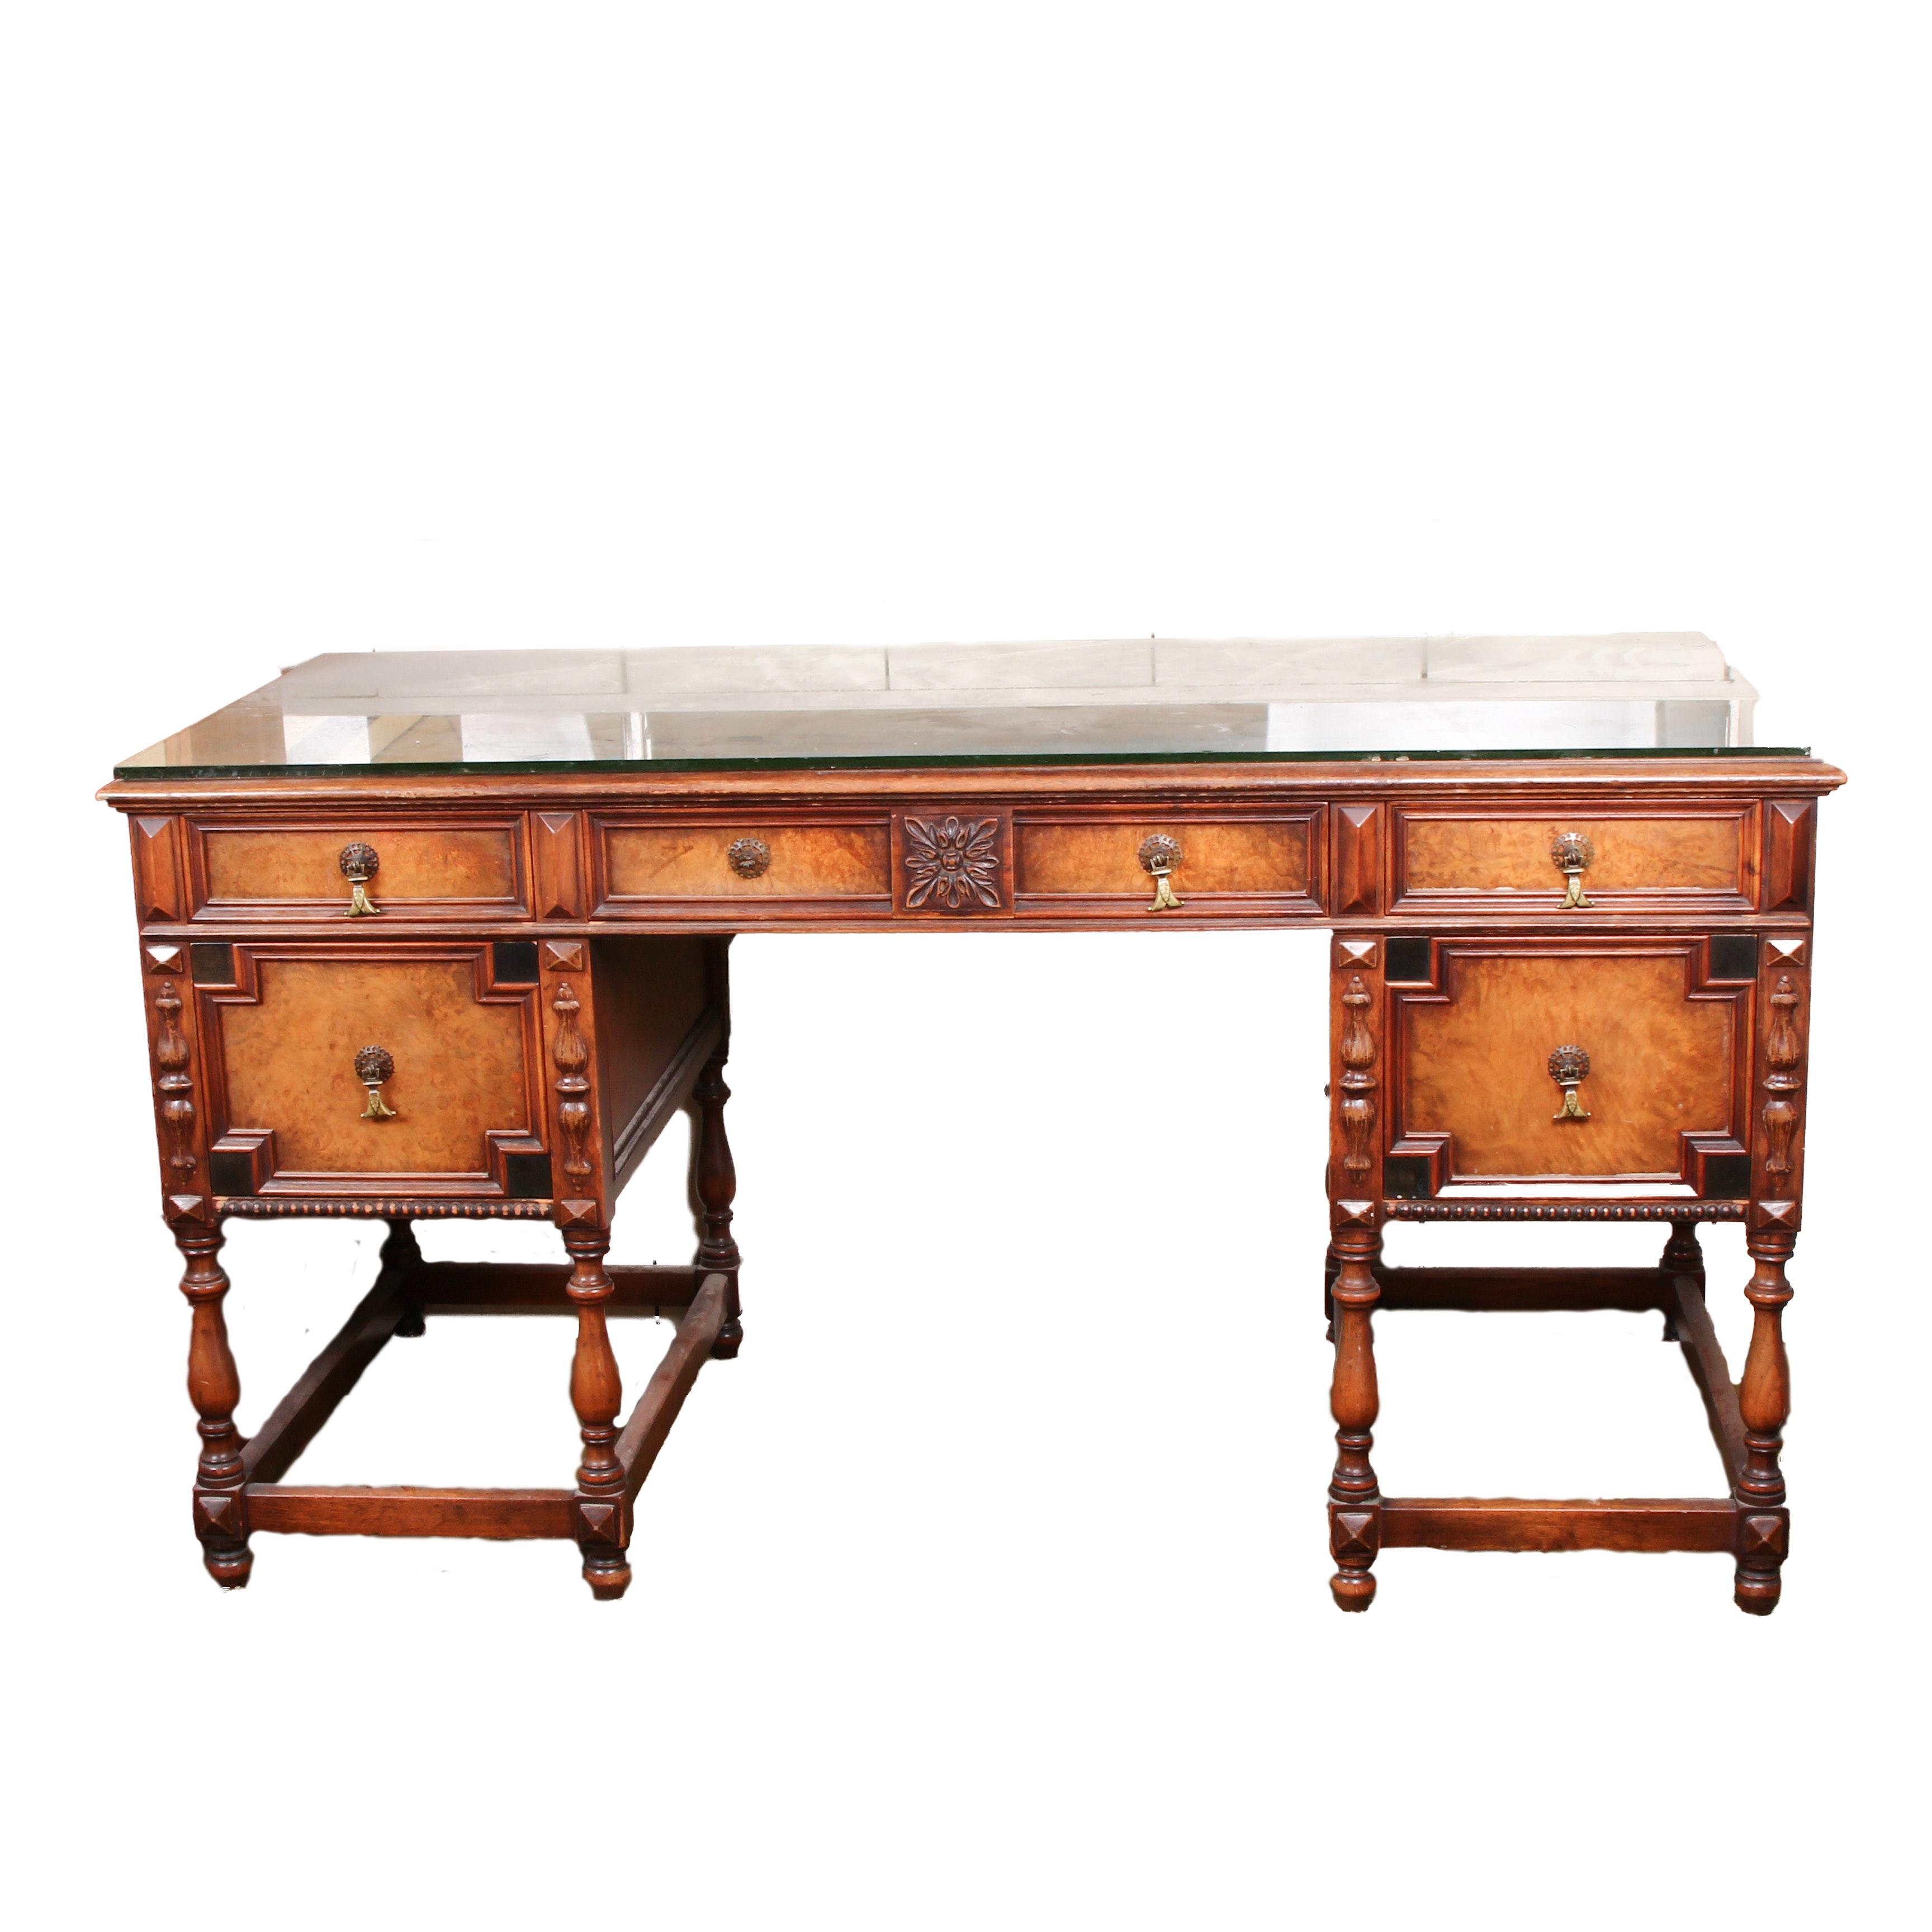 Johnson-Handley Jacobean Revival Oak Desk